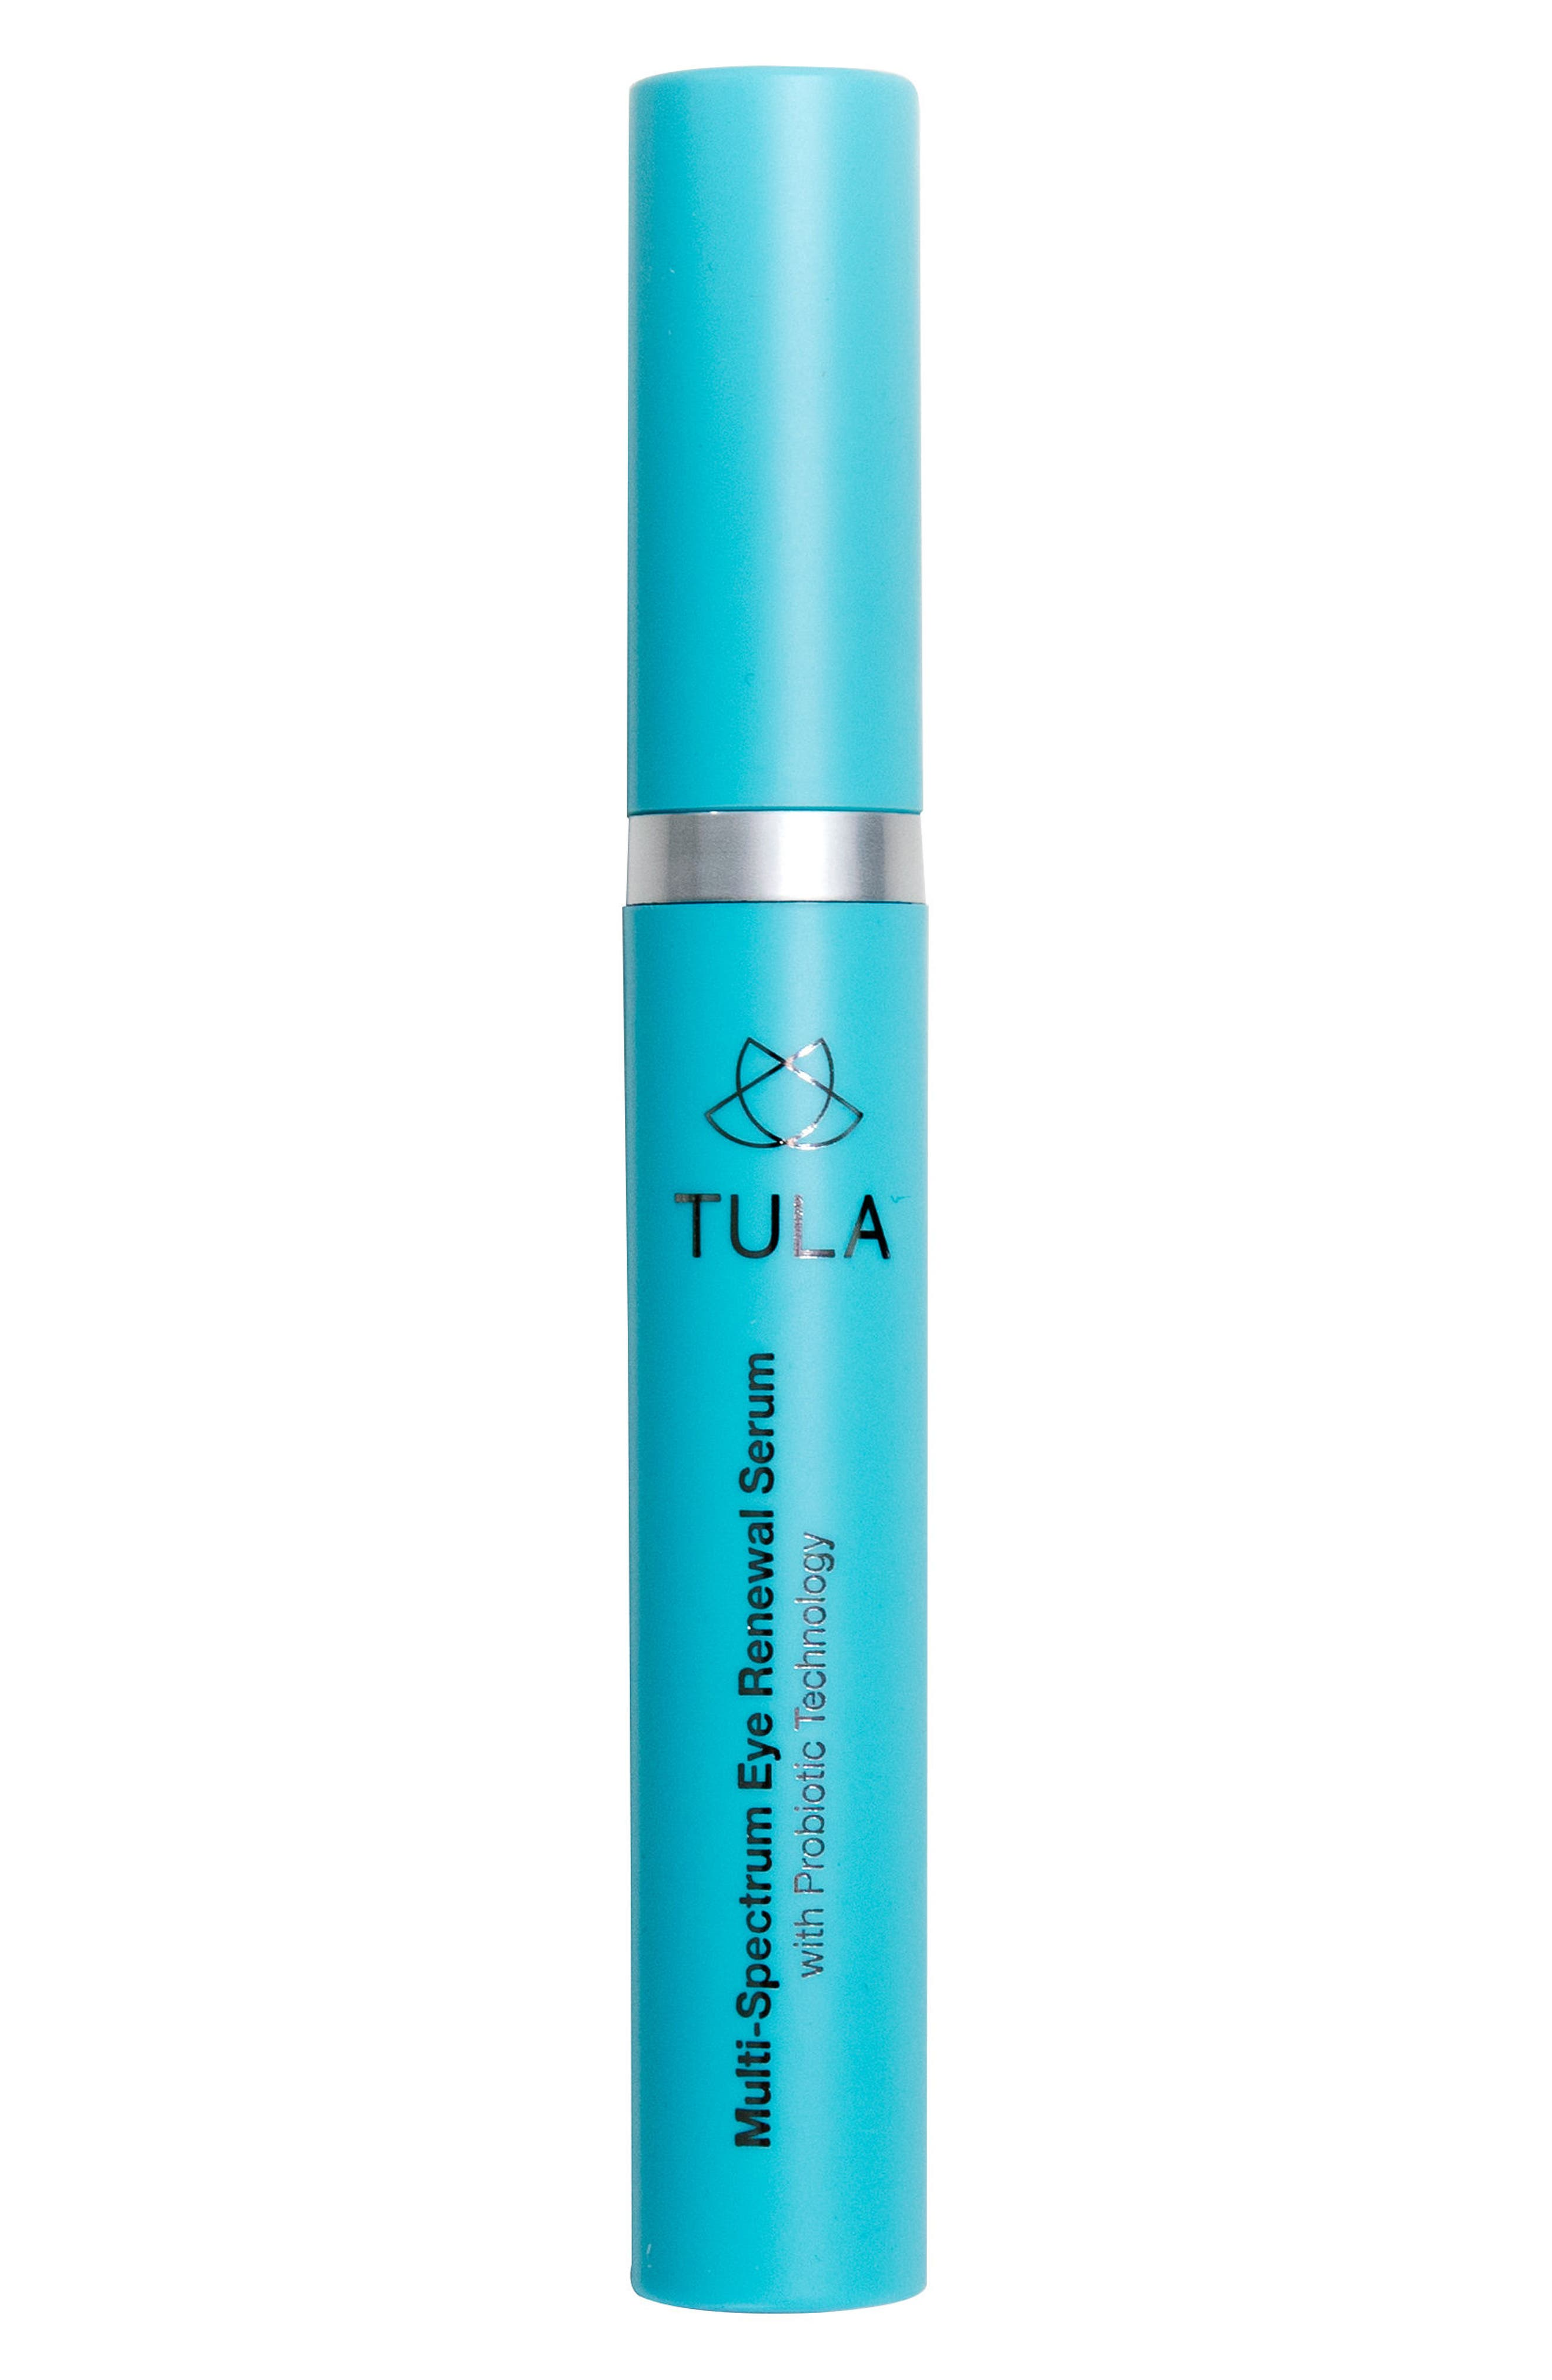 Tula Probiotic Skincare Multi-Spectrum Eye Renewal Serum